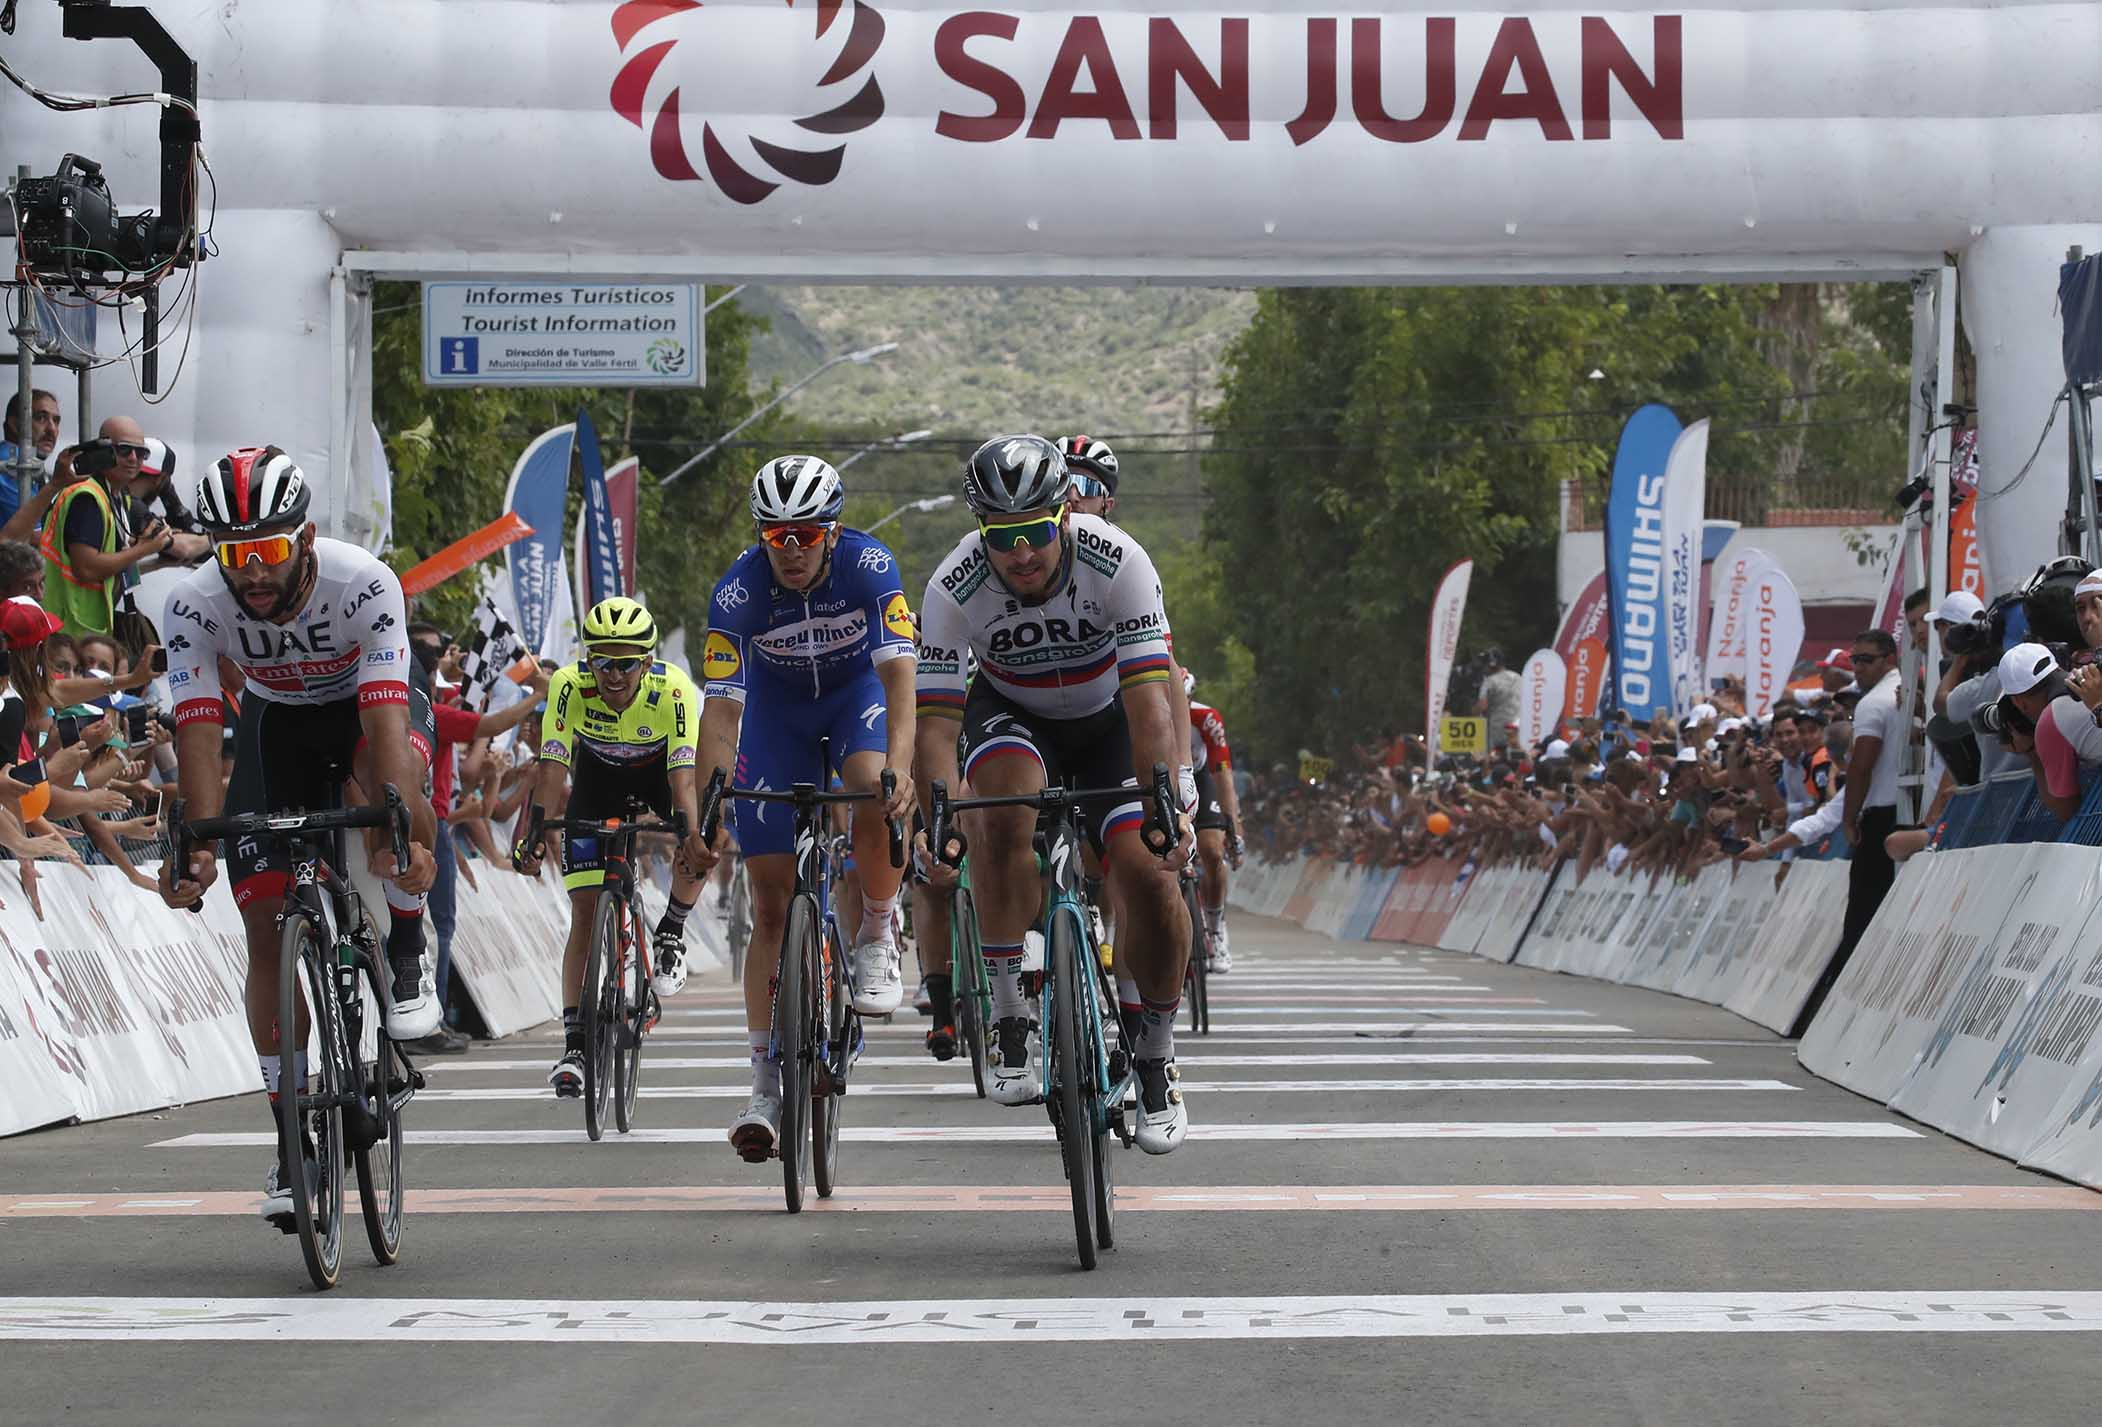 Fernando Gaviria vince la quarta tappa della Vuelta a San Juan 2019